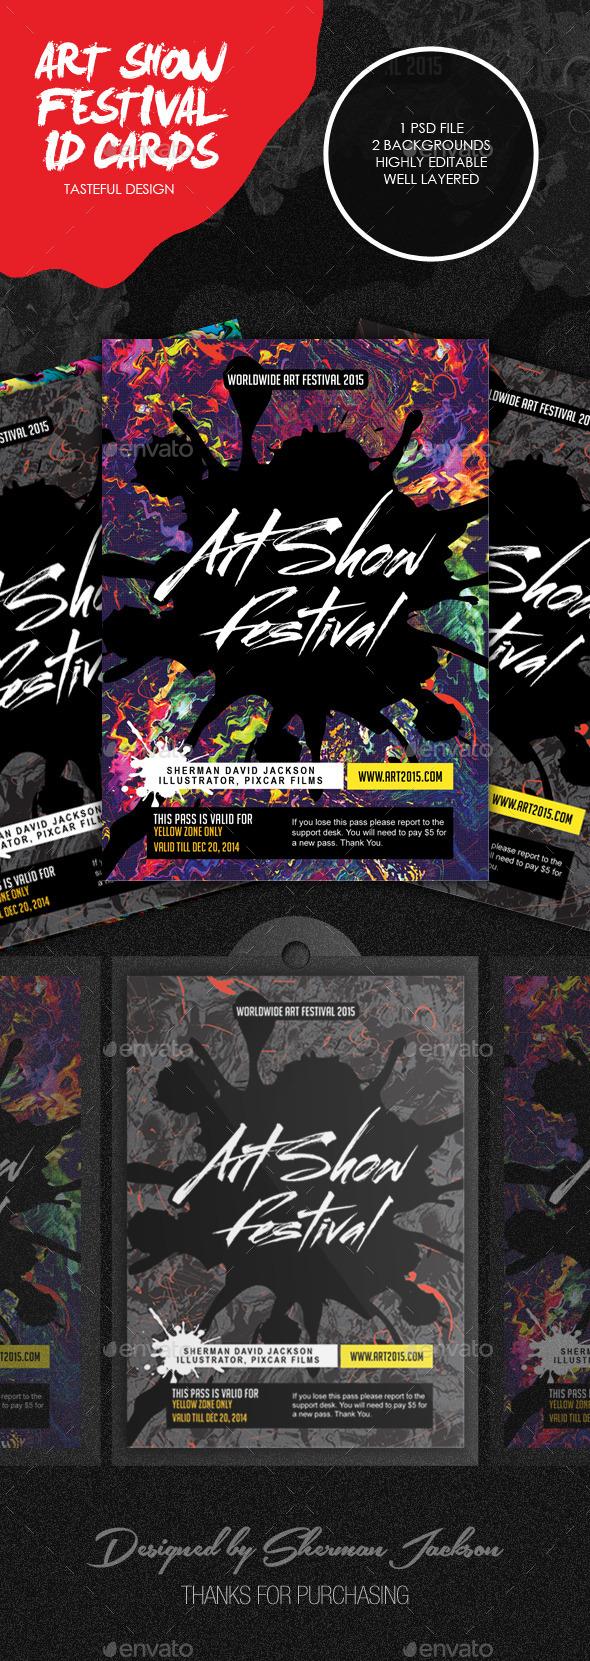 Art Show Festival ID Cards & Badge - Print Templates